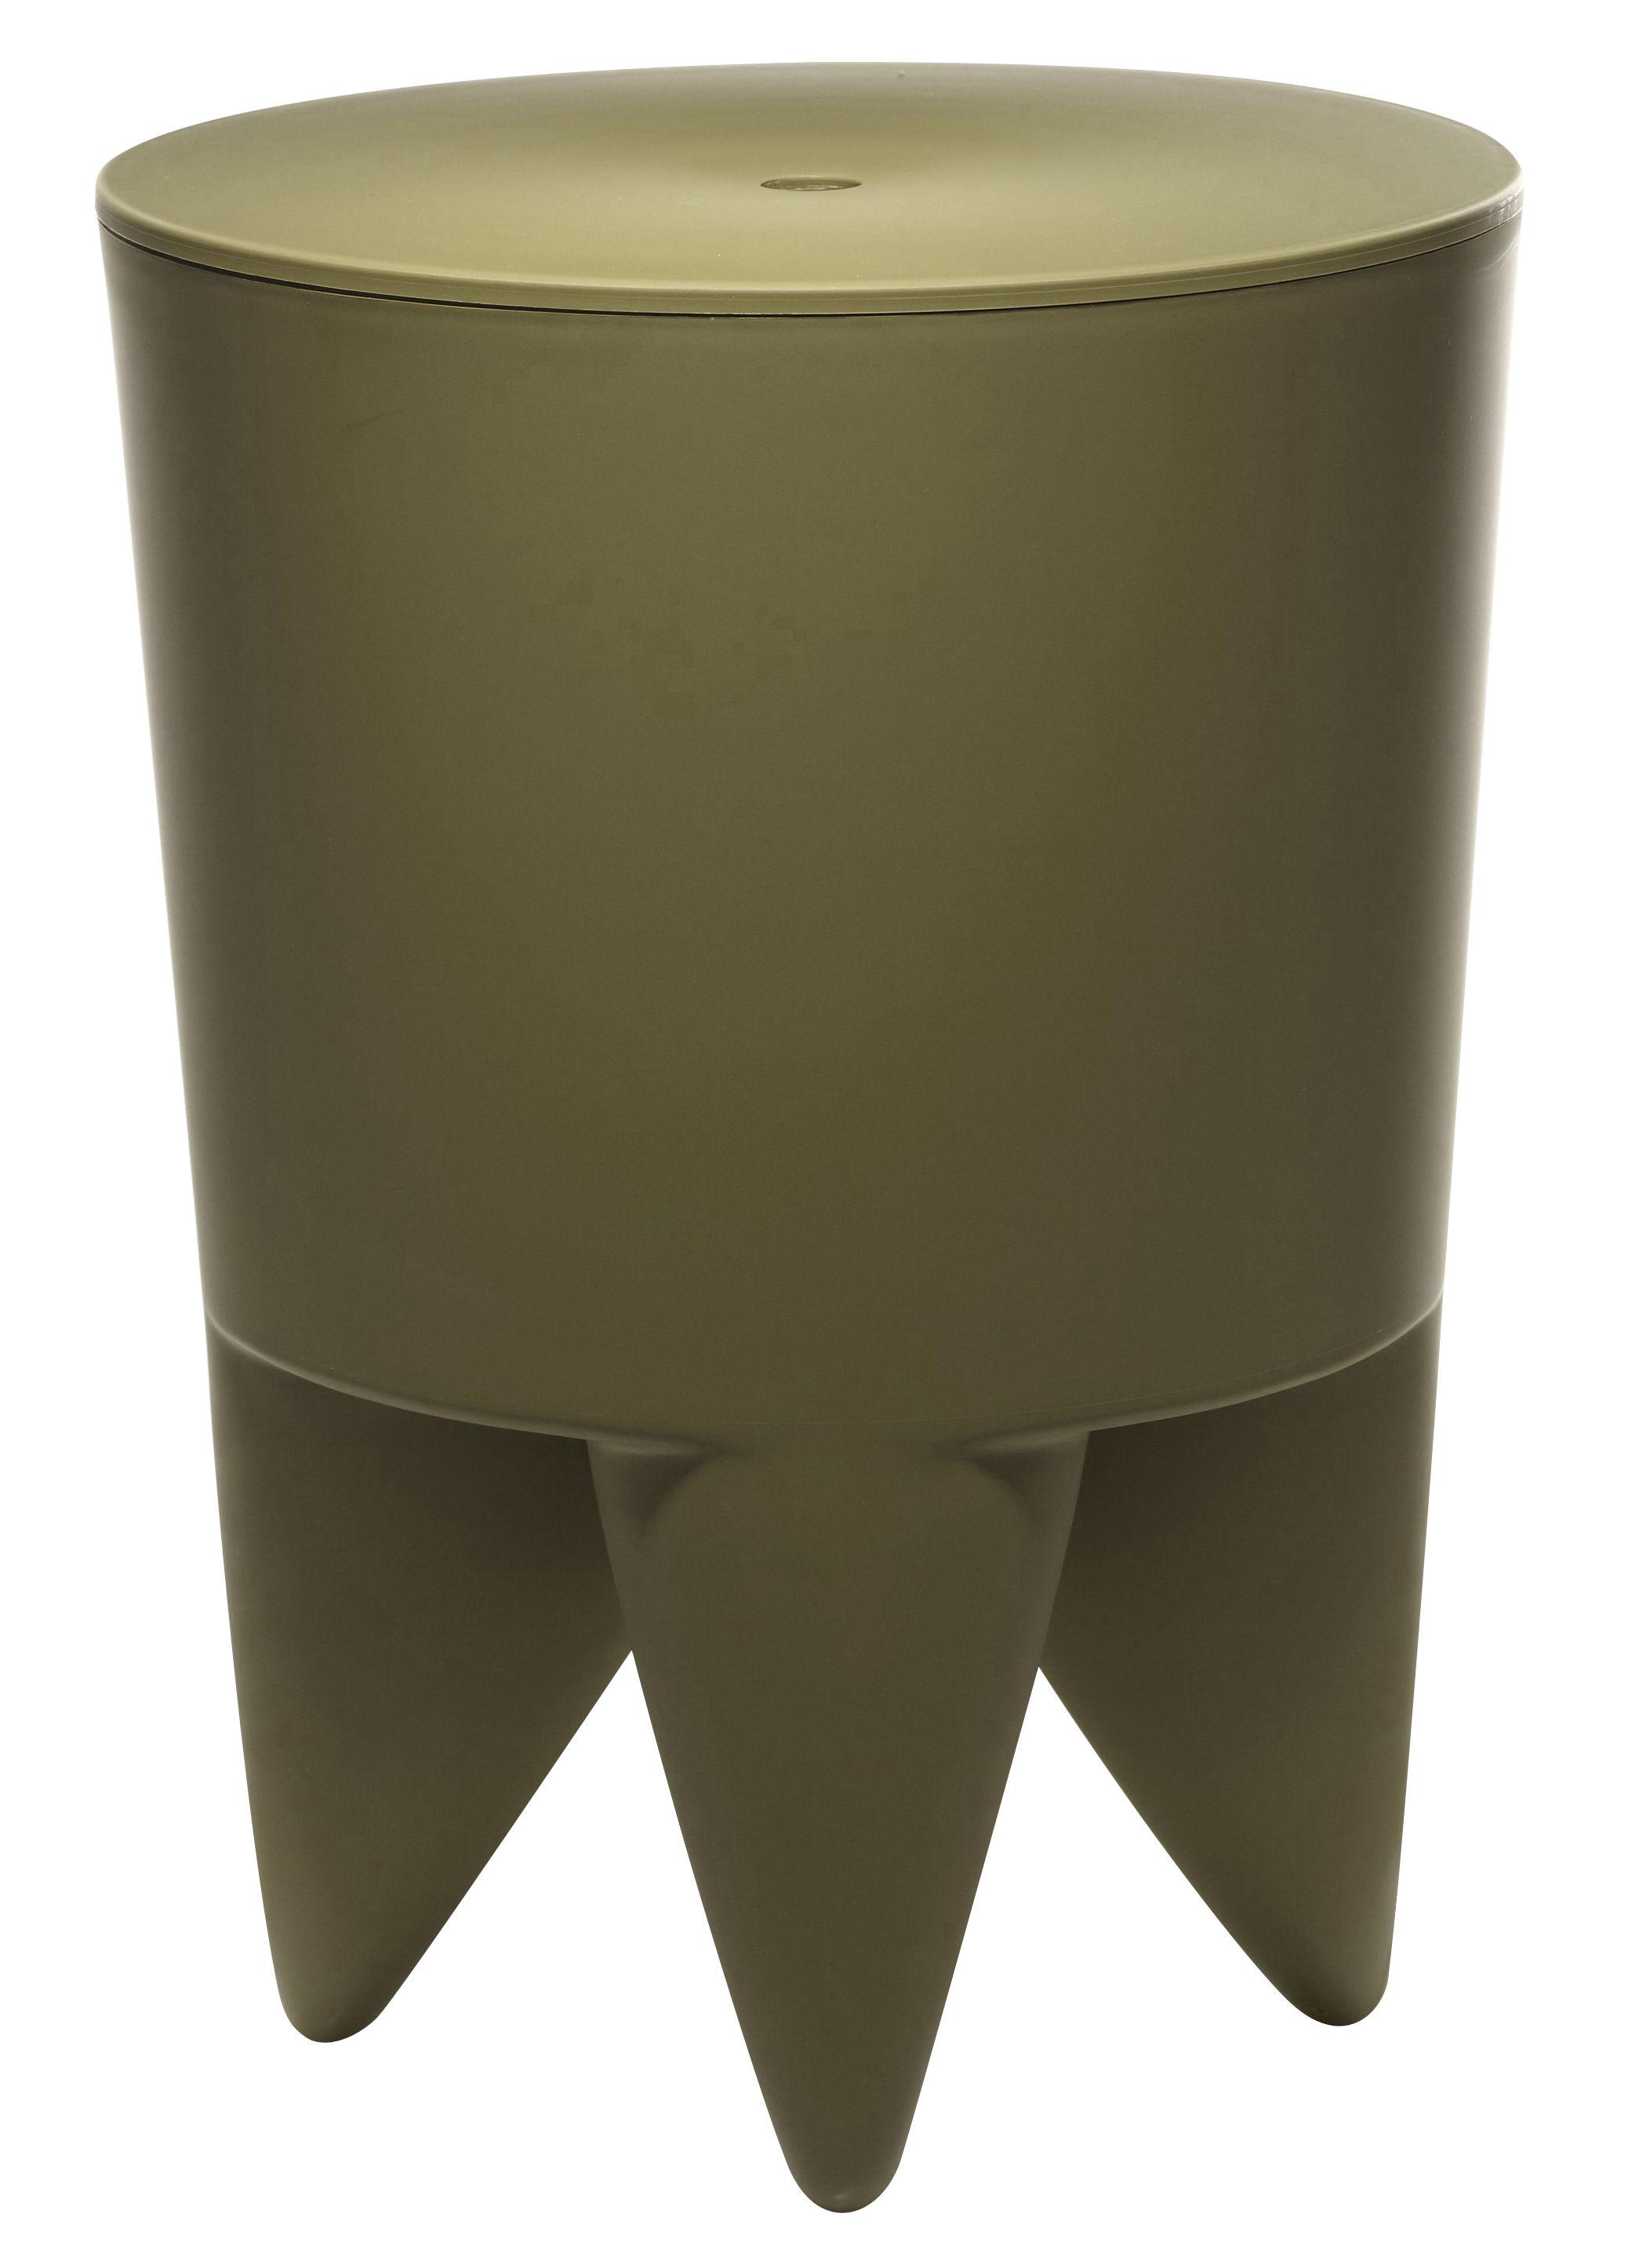 Furniture - Teen furniture - New Bubu 1er Stool by XO - Kaki - Polypropylene